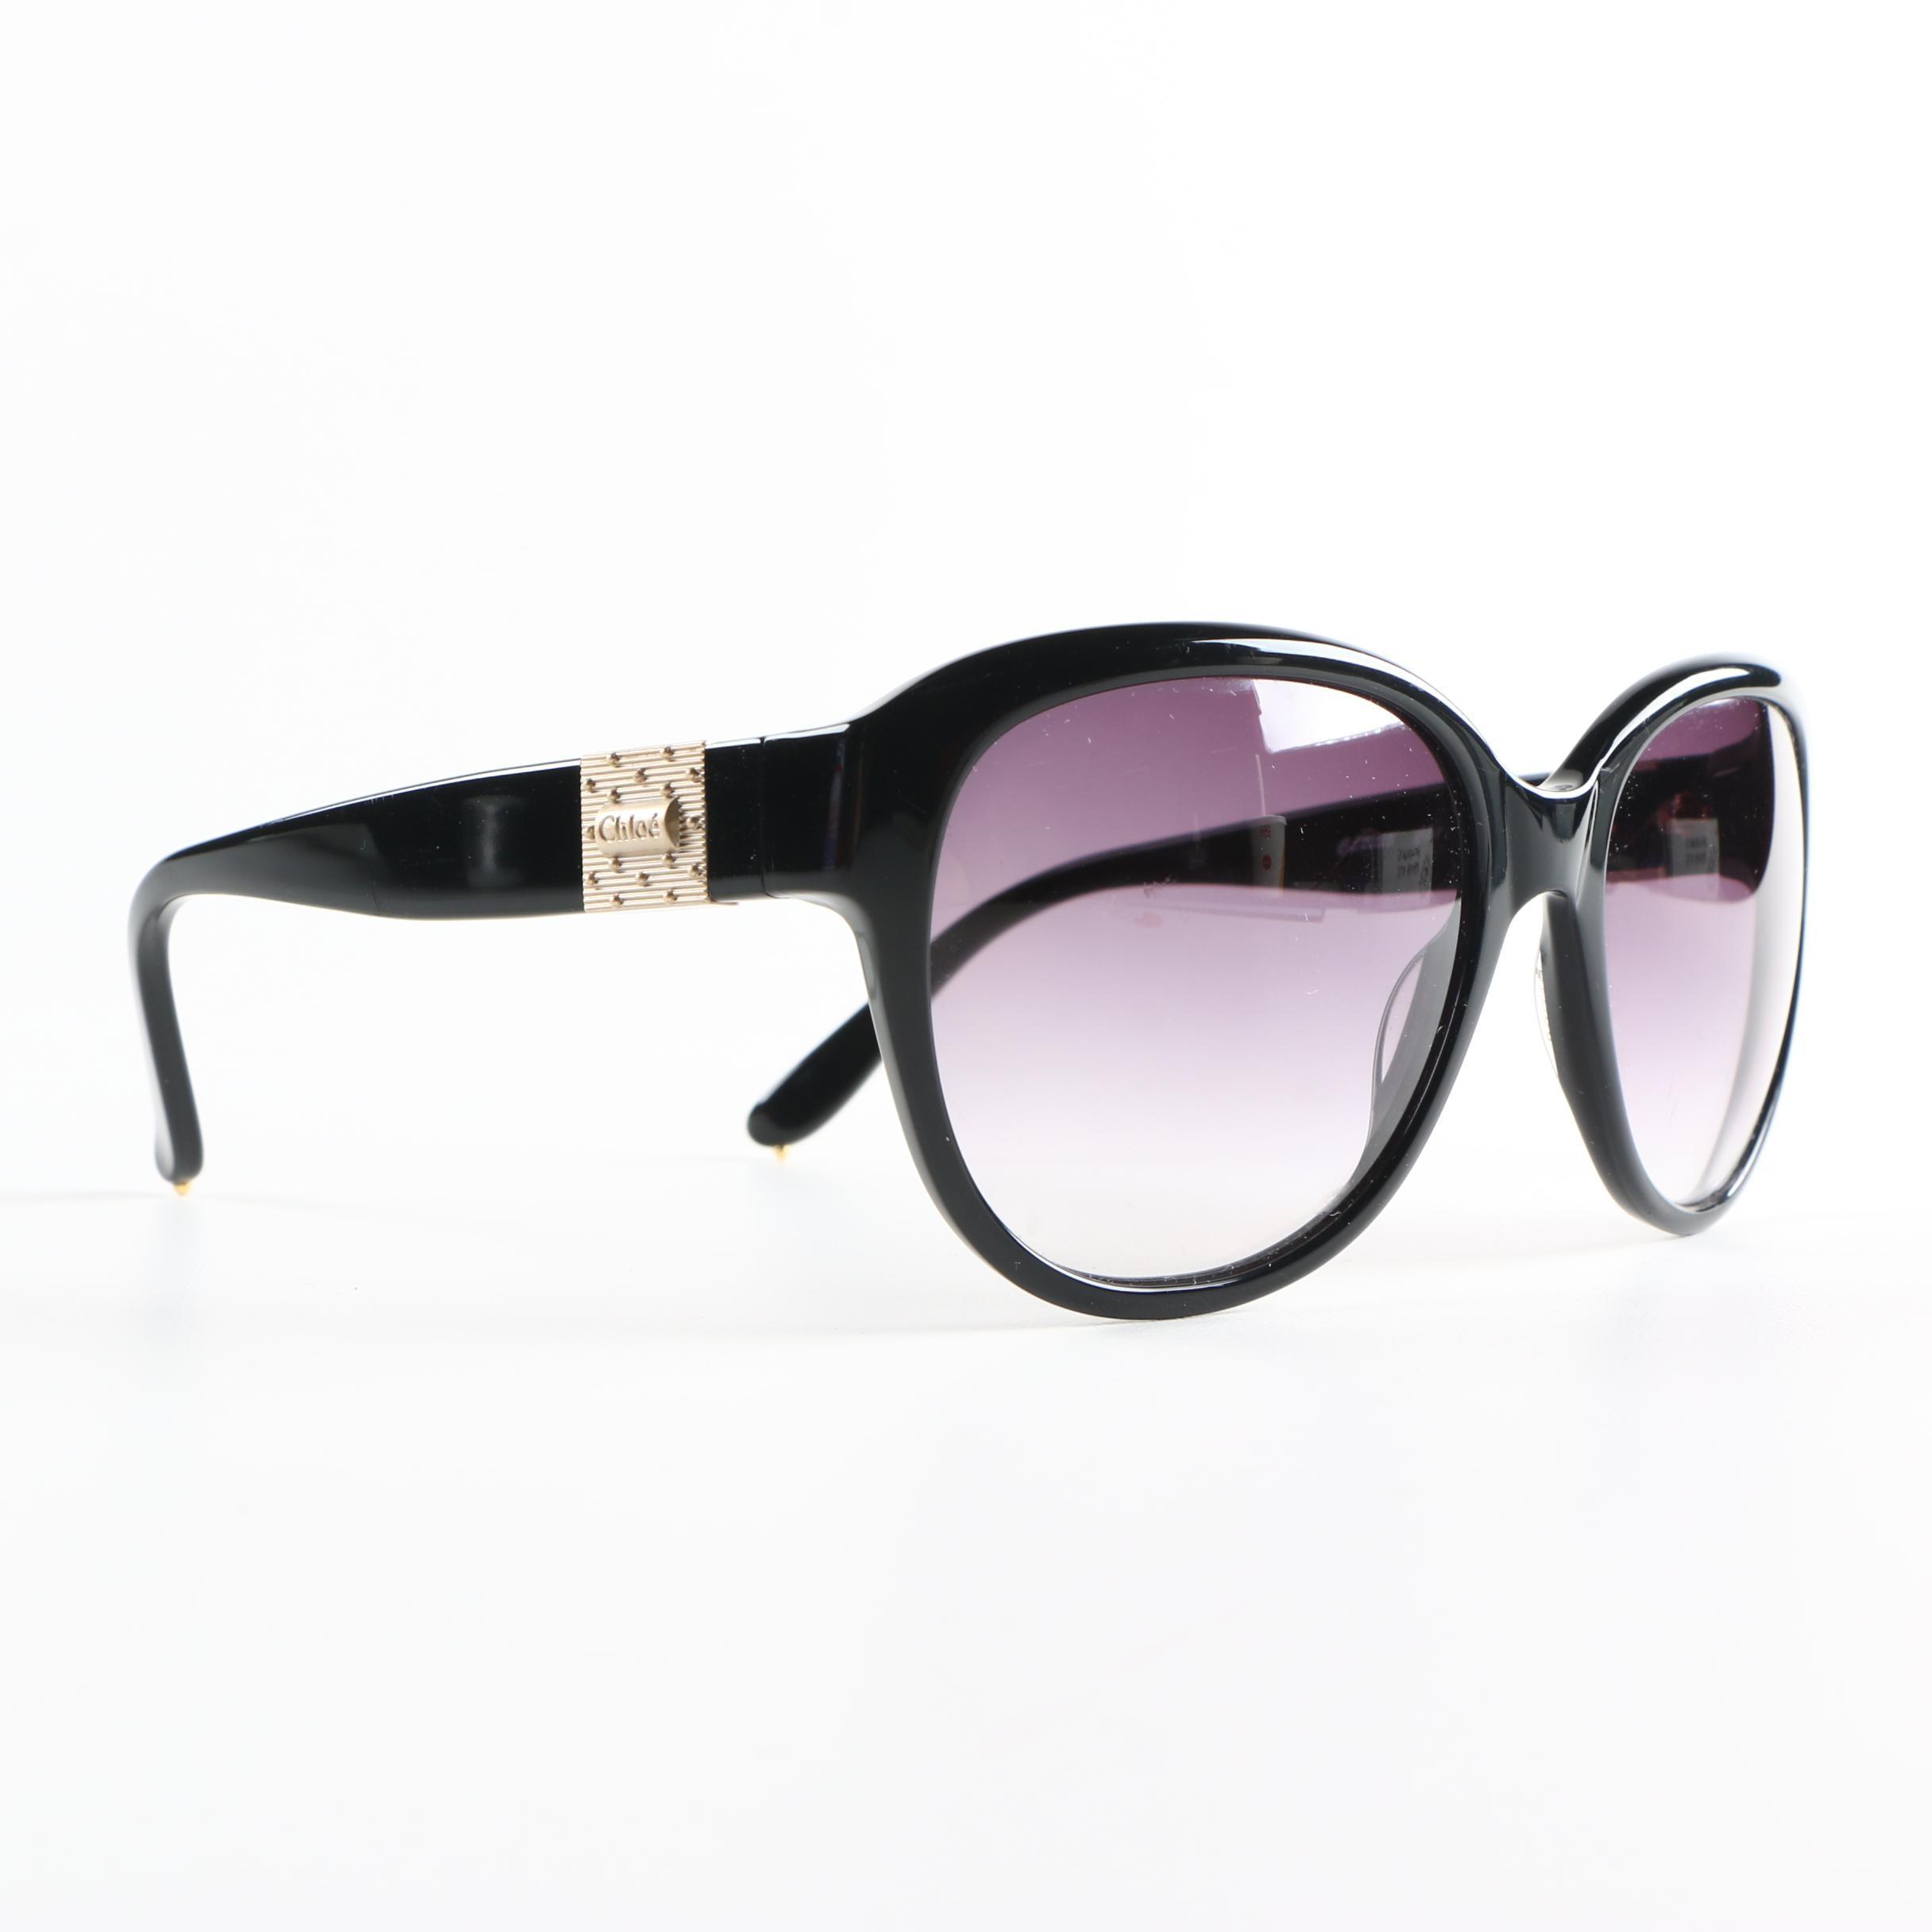 Chloé Large Round Sunglasses